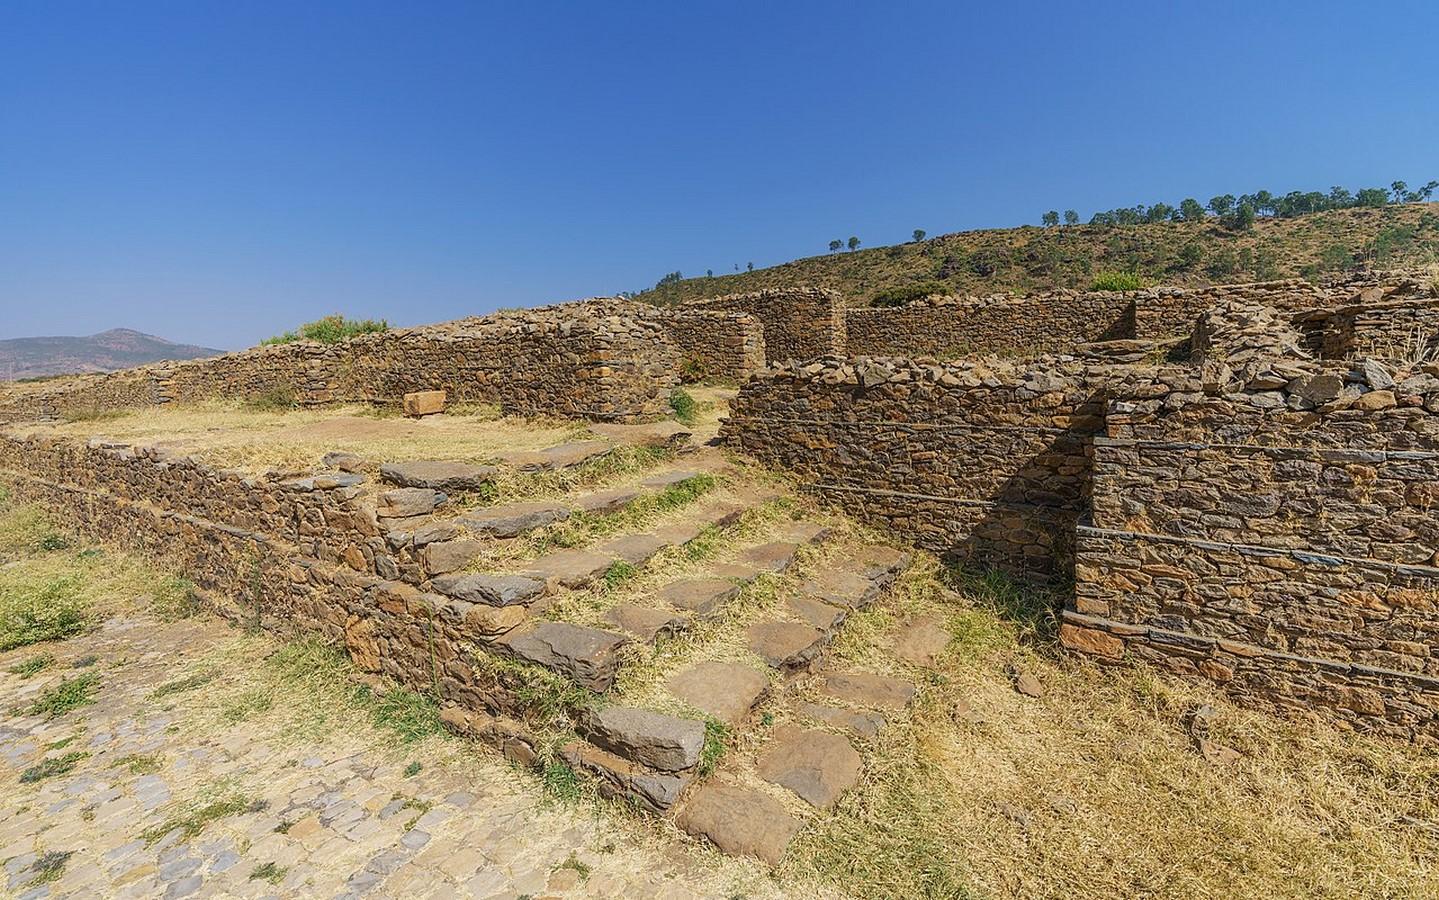 Aksumite architecture: Architecture of Ethiopia - Sheet13